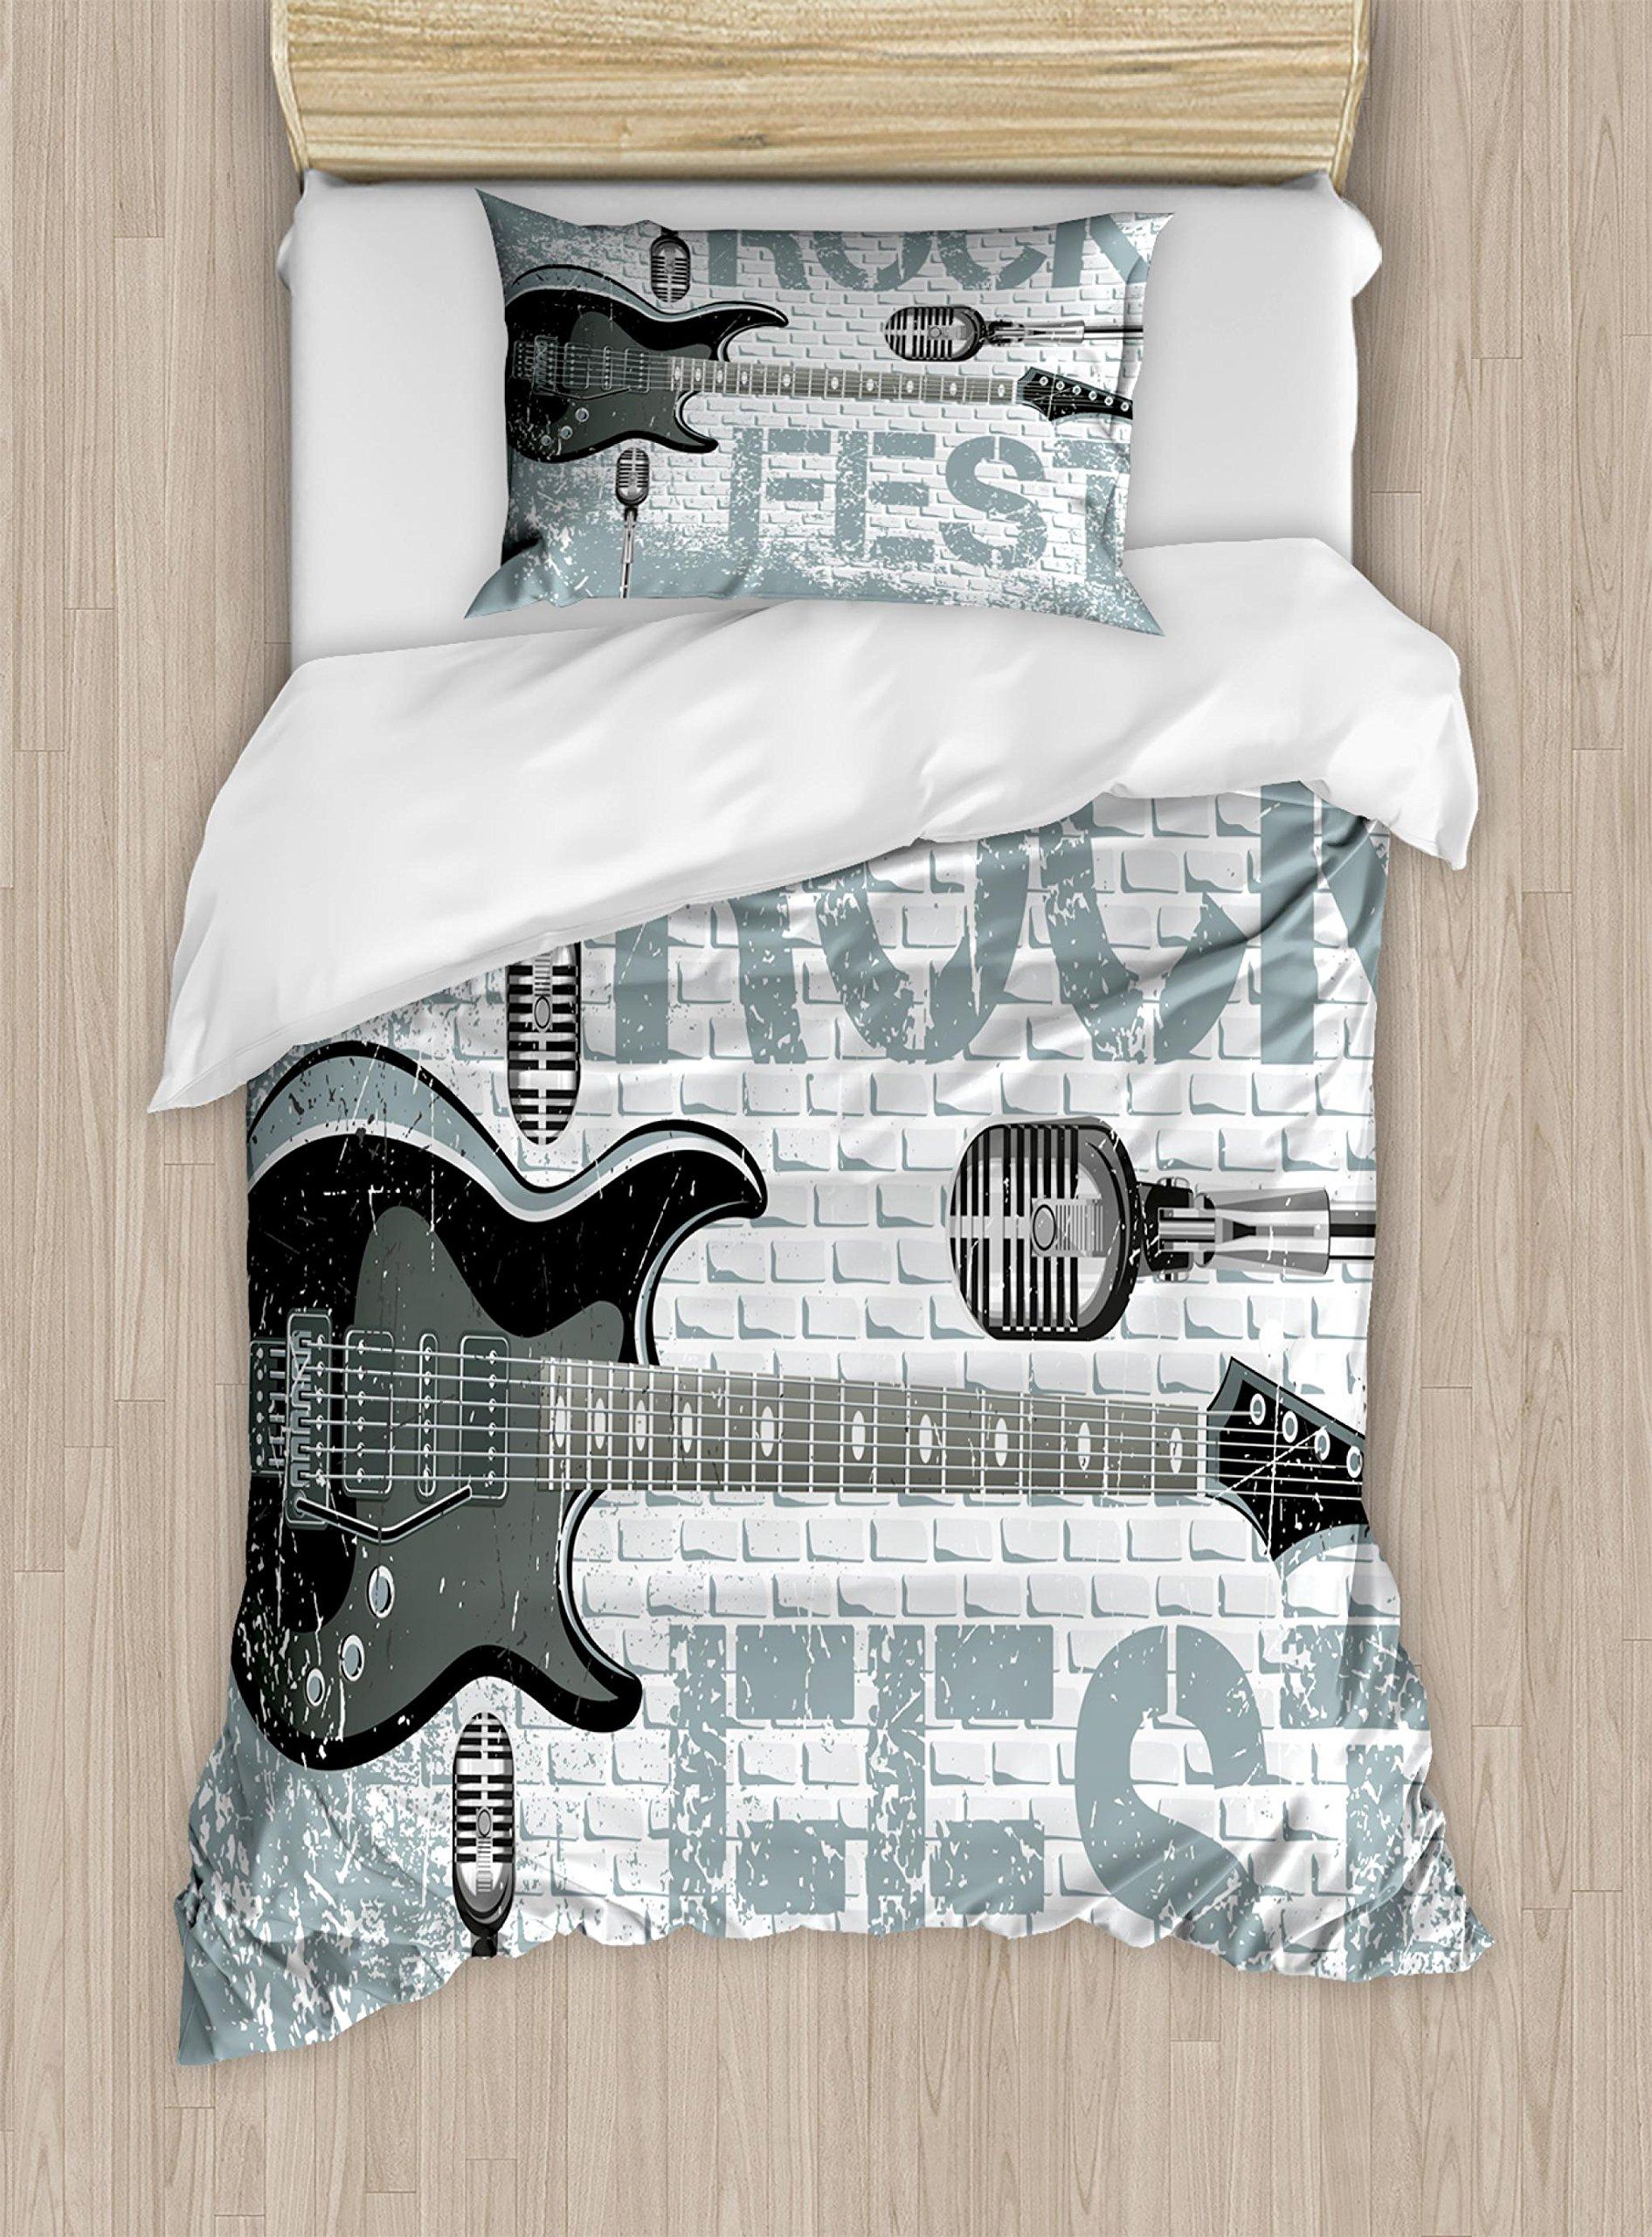 Ambesonne Rock Music Duvet Cover Set Twin Size, Grunge Color Splashed Brick Wall Background Electronic Guitar Mics Design, Decorative 2 Piece Bedding Set with 1 Pillow Sham, Blue Grey Black